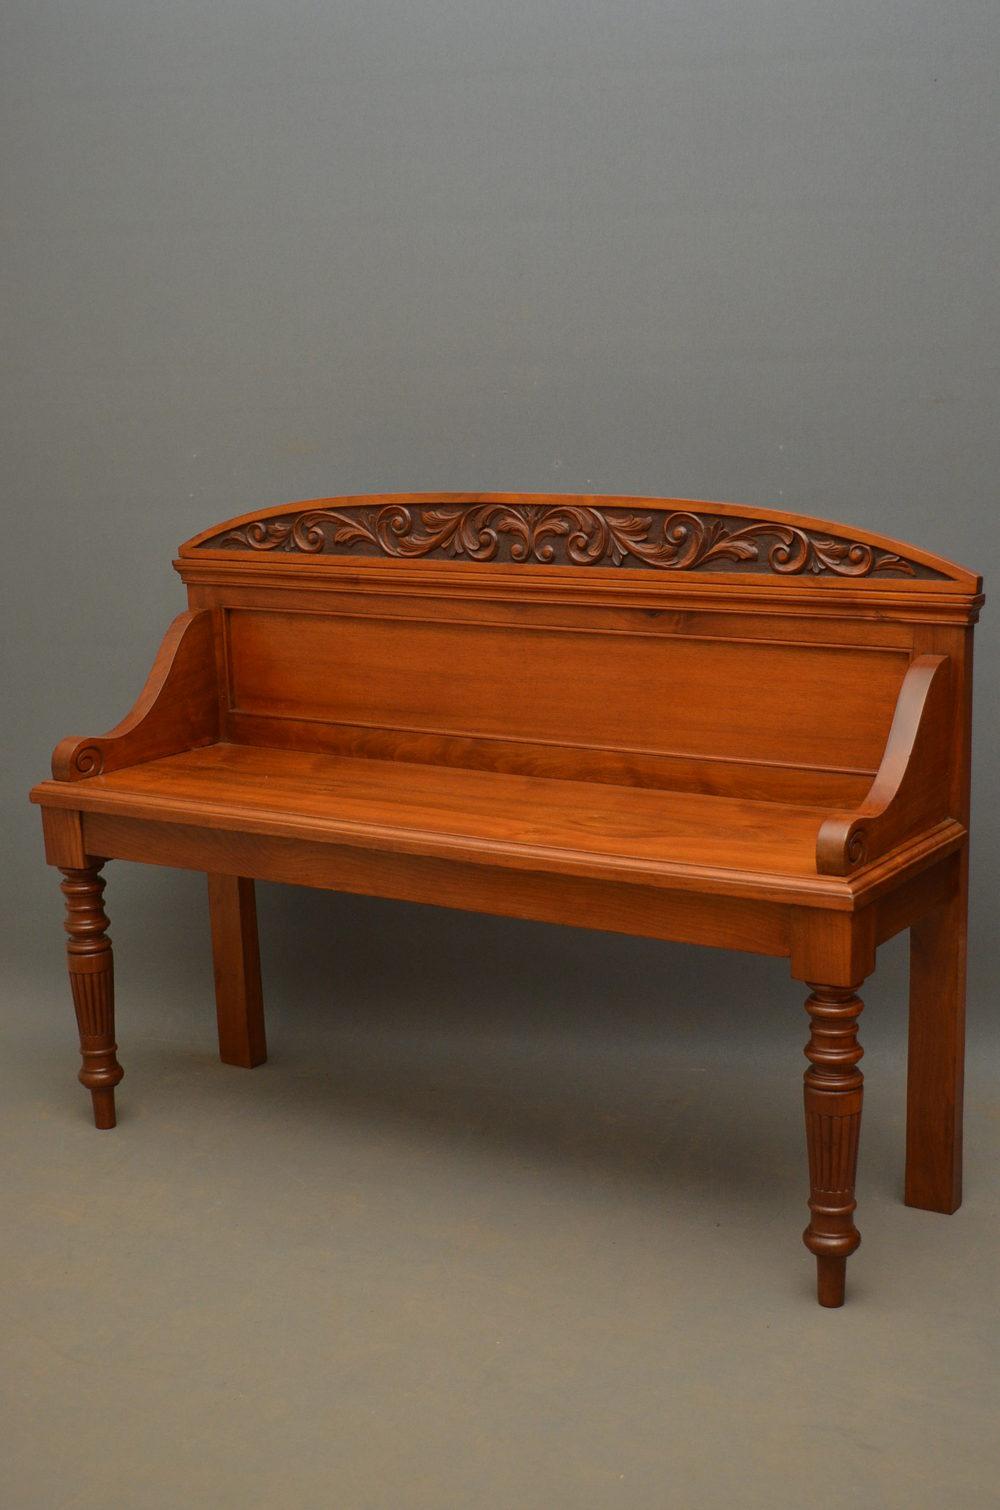 Stylish Victorian Bench In Walnut Antiques Atlas